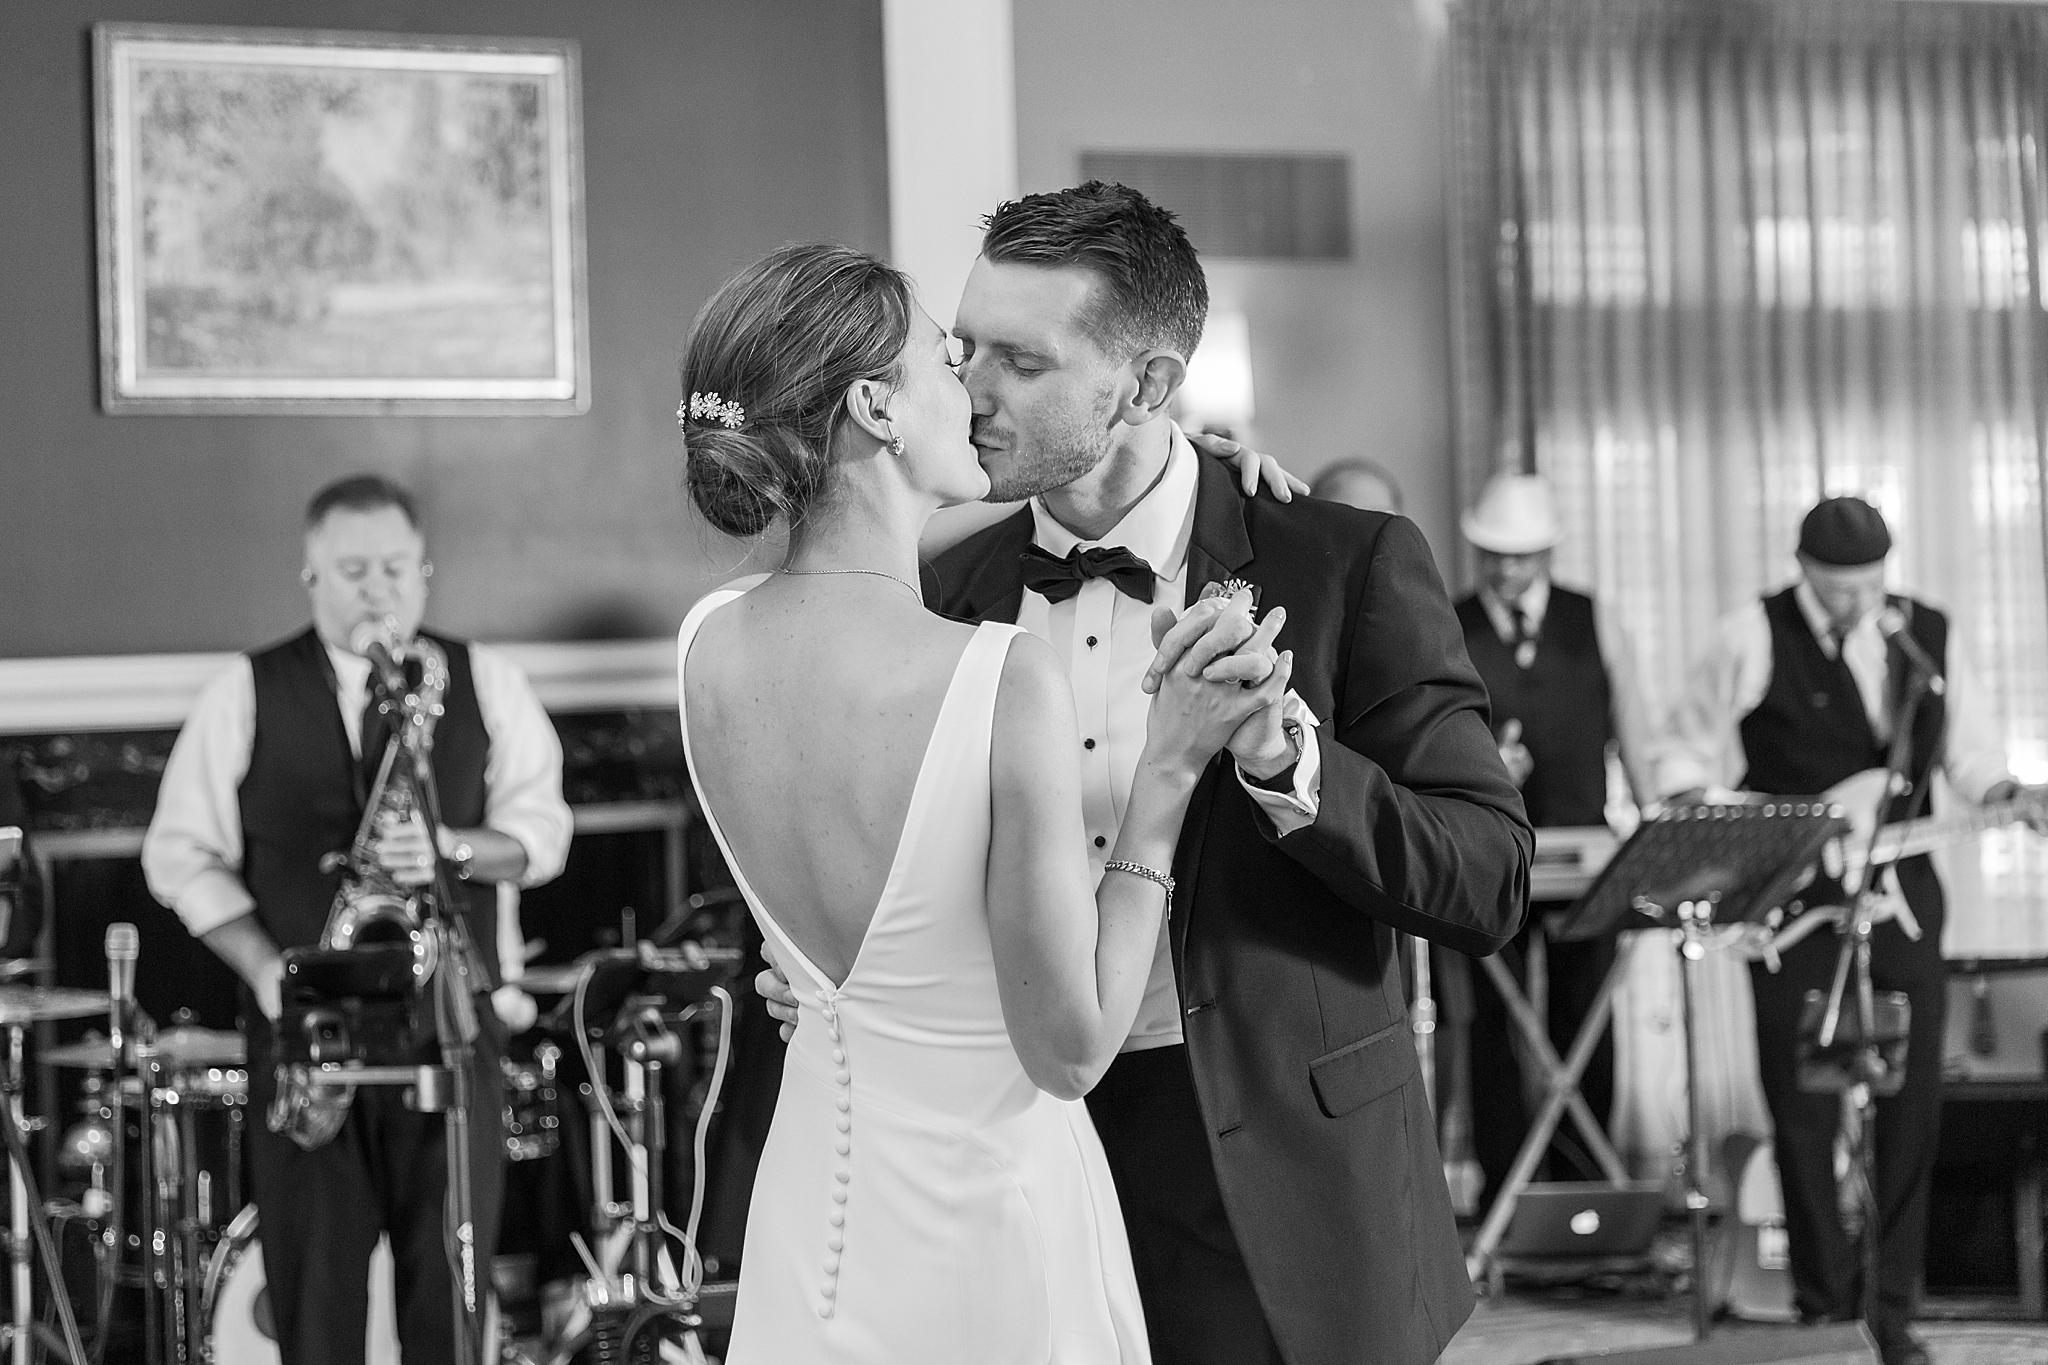 detroit-wedding-photographer-grosse-pointe-academy-chapel-detroit-golf-club-wedding-carly-matt-by-courtney-carolyn-photography_0091.jpg